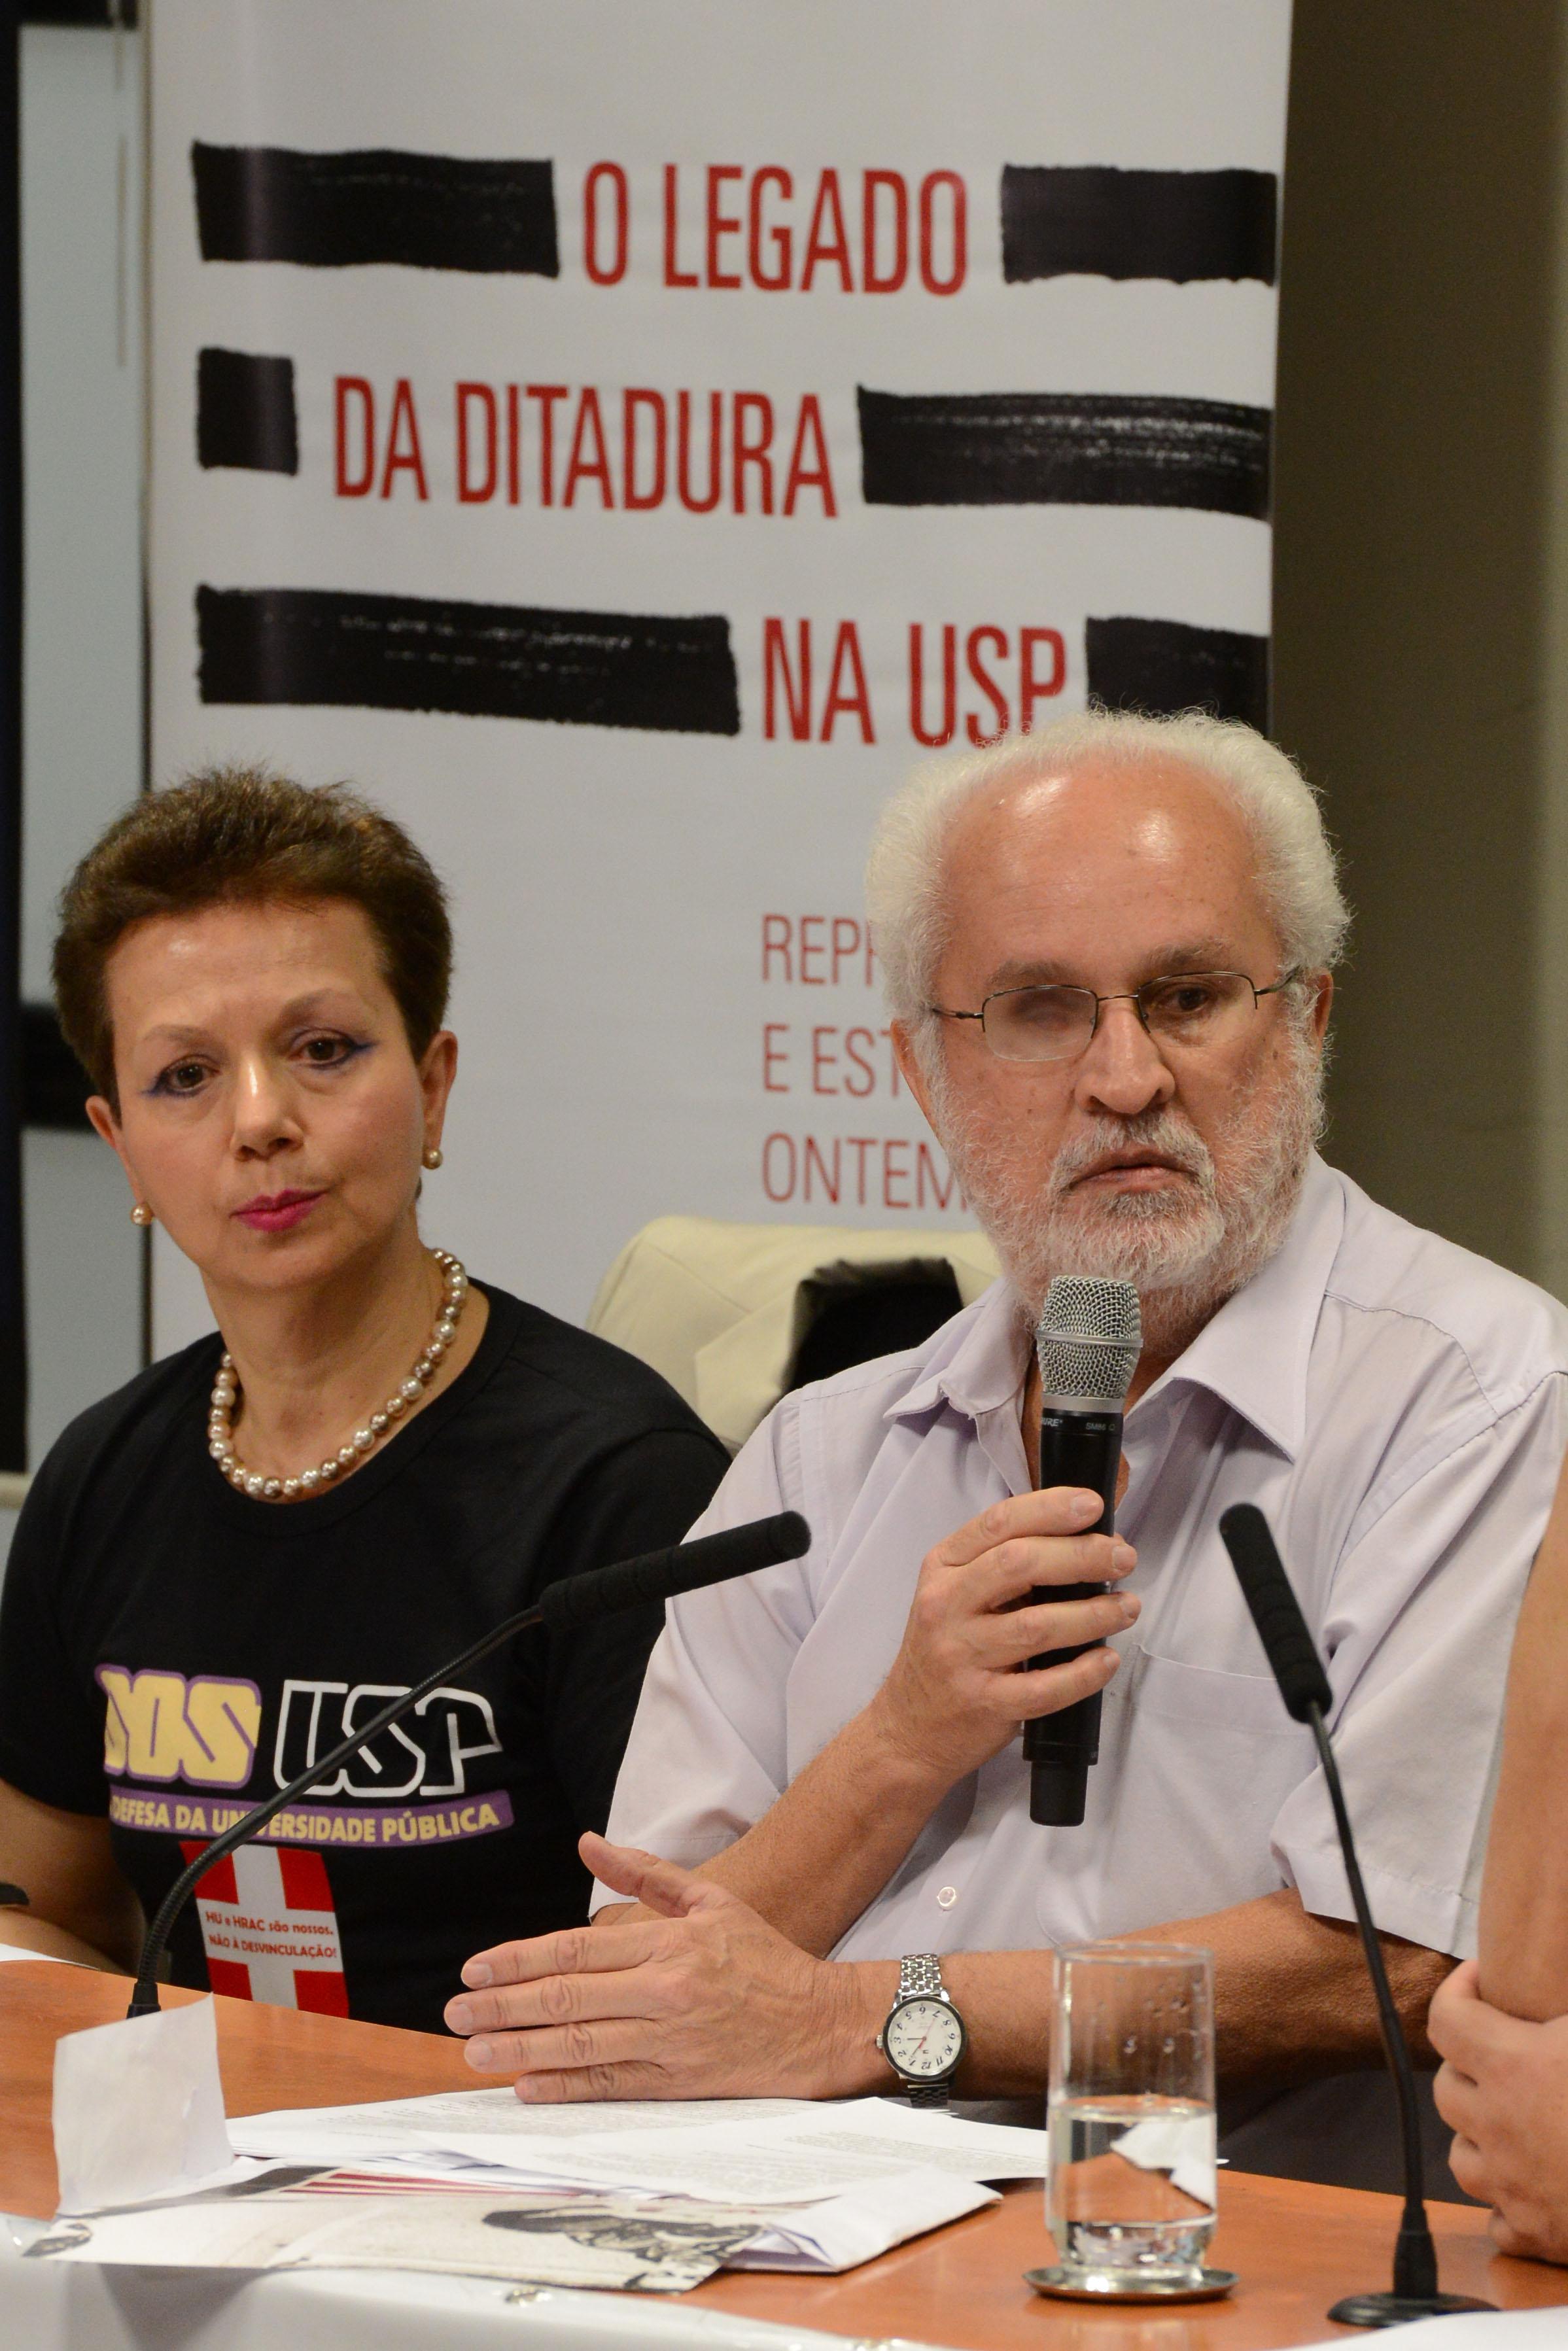 Maria Betti e Silvio Salinas <a style='float:right' href='https://www3.al.sp.gov.br/repositorio/noticia/N-09-2014/fg165053.jpg' target=_blank><img src='/_img/material-file-download-white.png' width='14px' alt='Clique para baixar a imagem'></a>